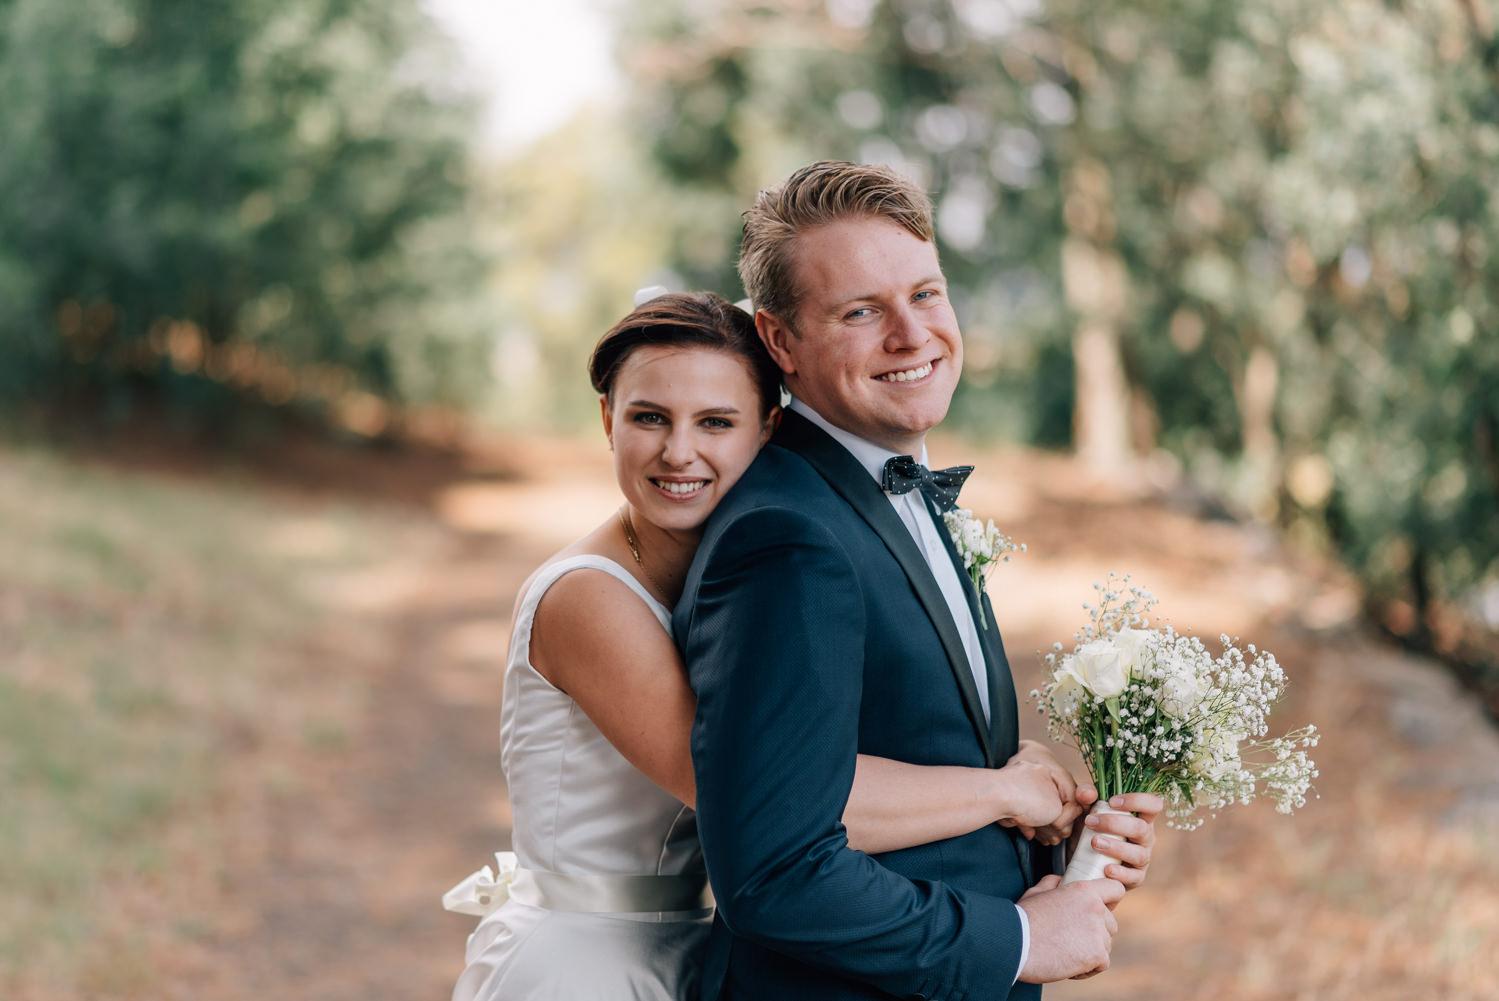 Josef-Chromy-Wedding-Photographer-53.jpg